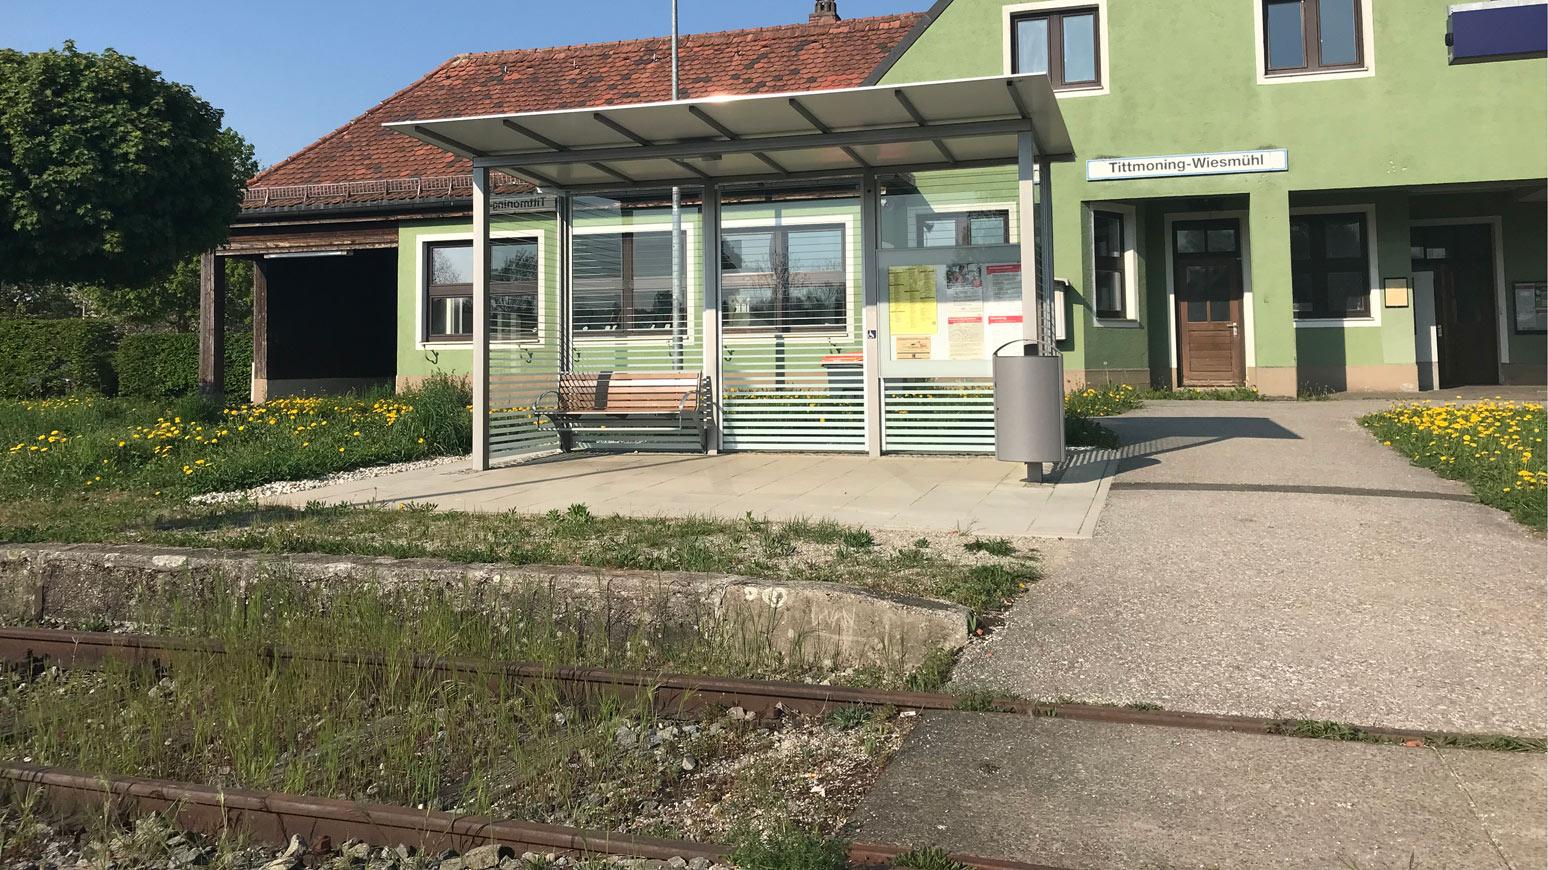 Bahnhof Tittmoning-Wiemühl